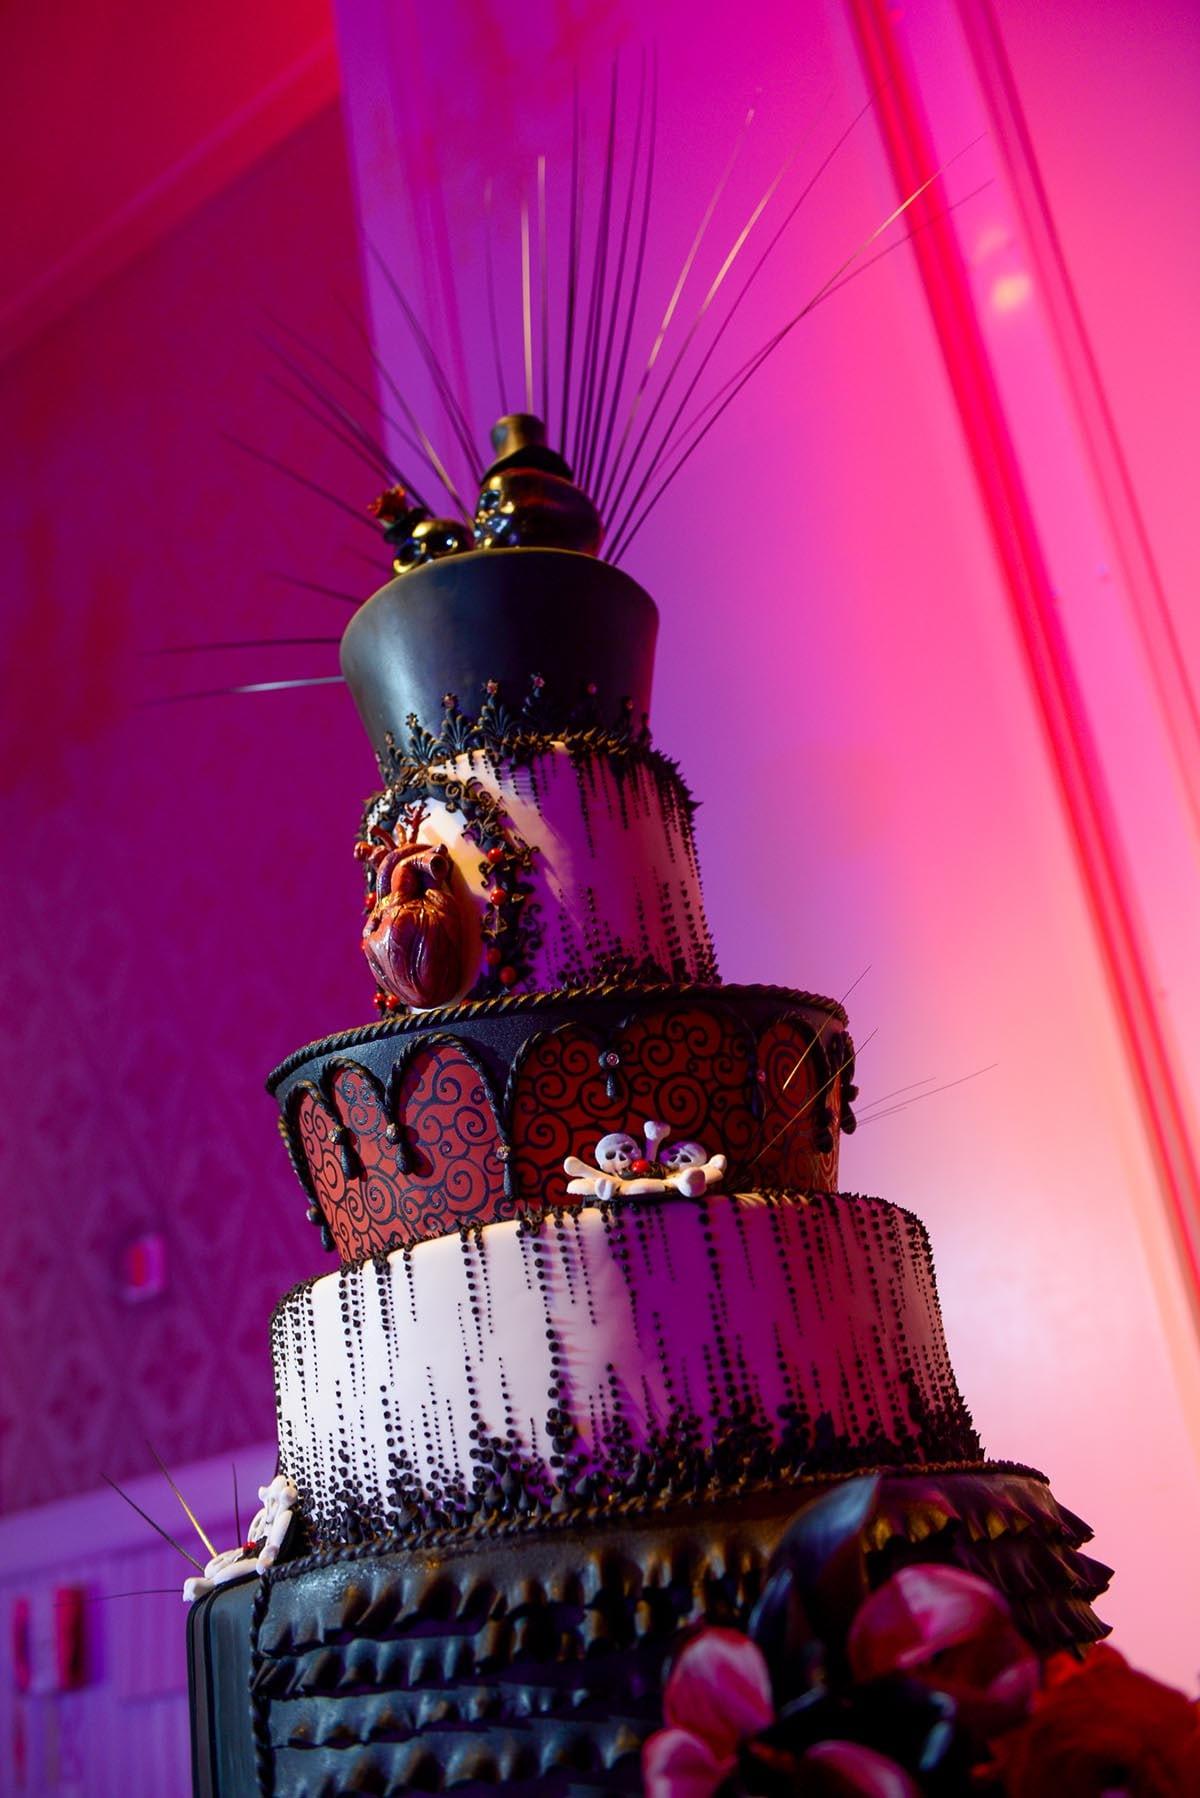 Wedding Cake Wednesday: Gothic Cake | Disney Weddings| Disney Weddings